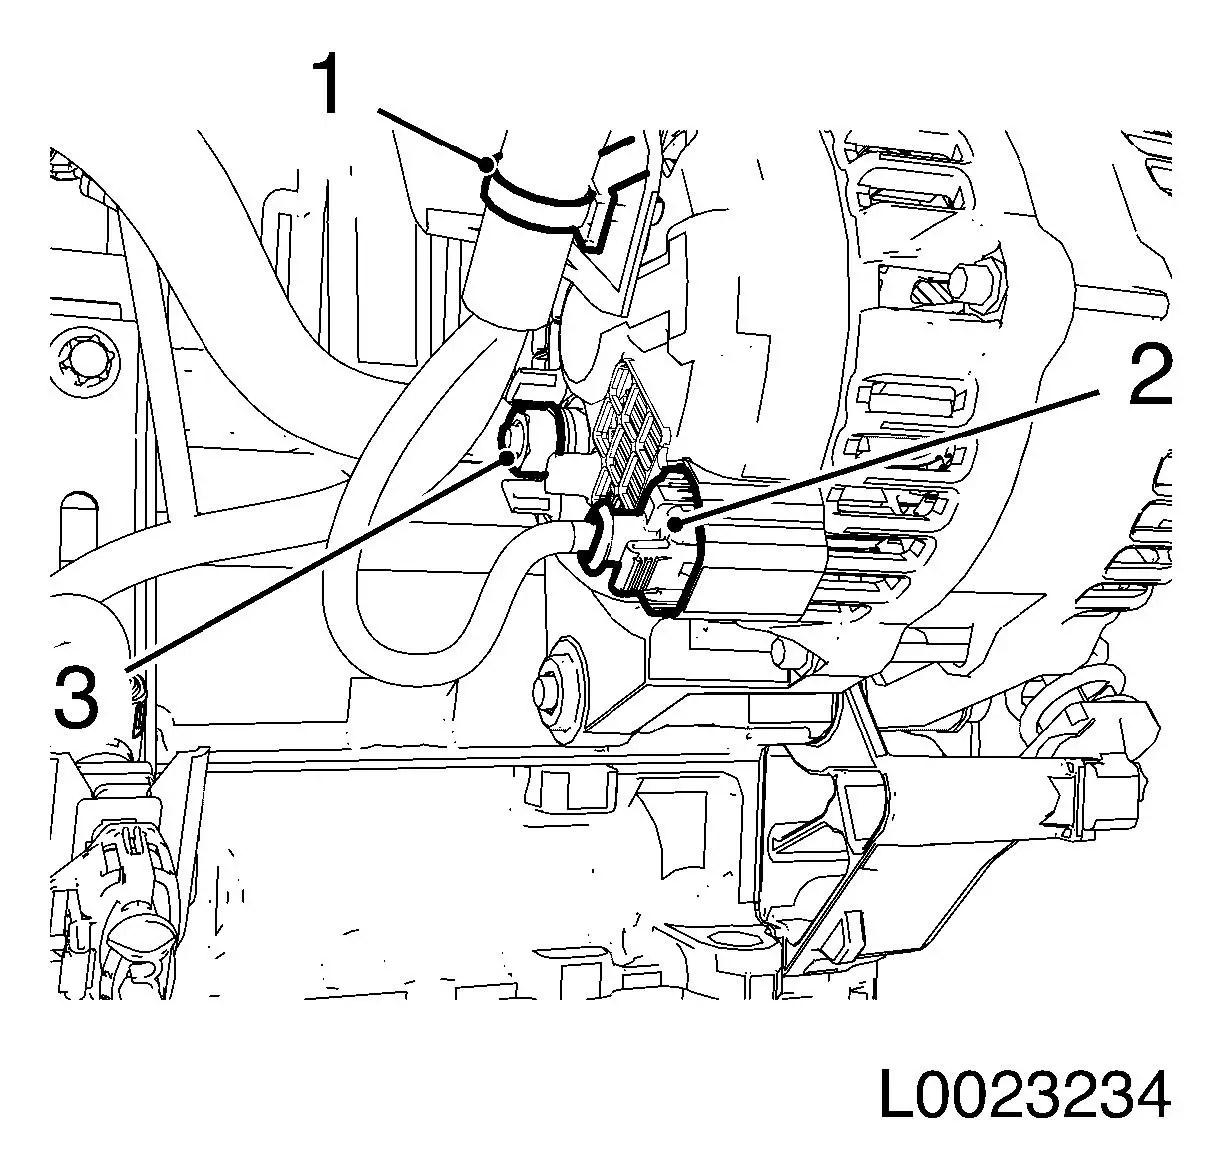 hight resolution of vauxhall workshop manuals u0026gt corsa d u0026gt j engine and engine